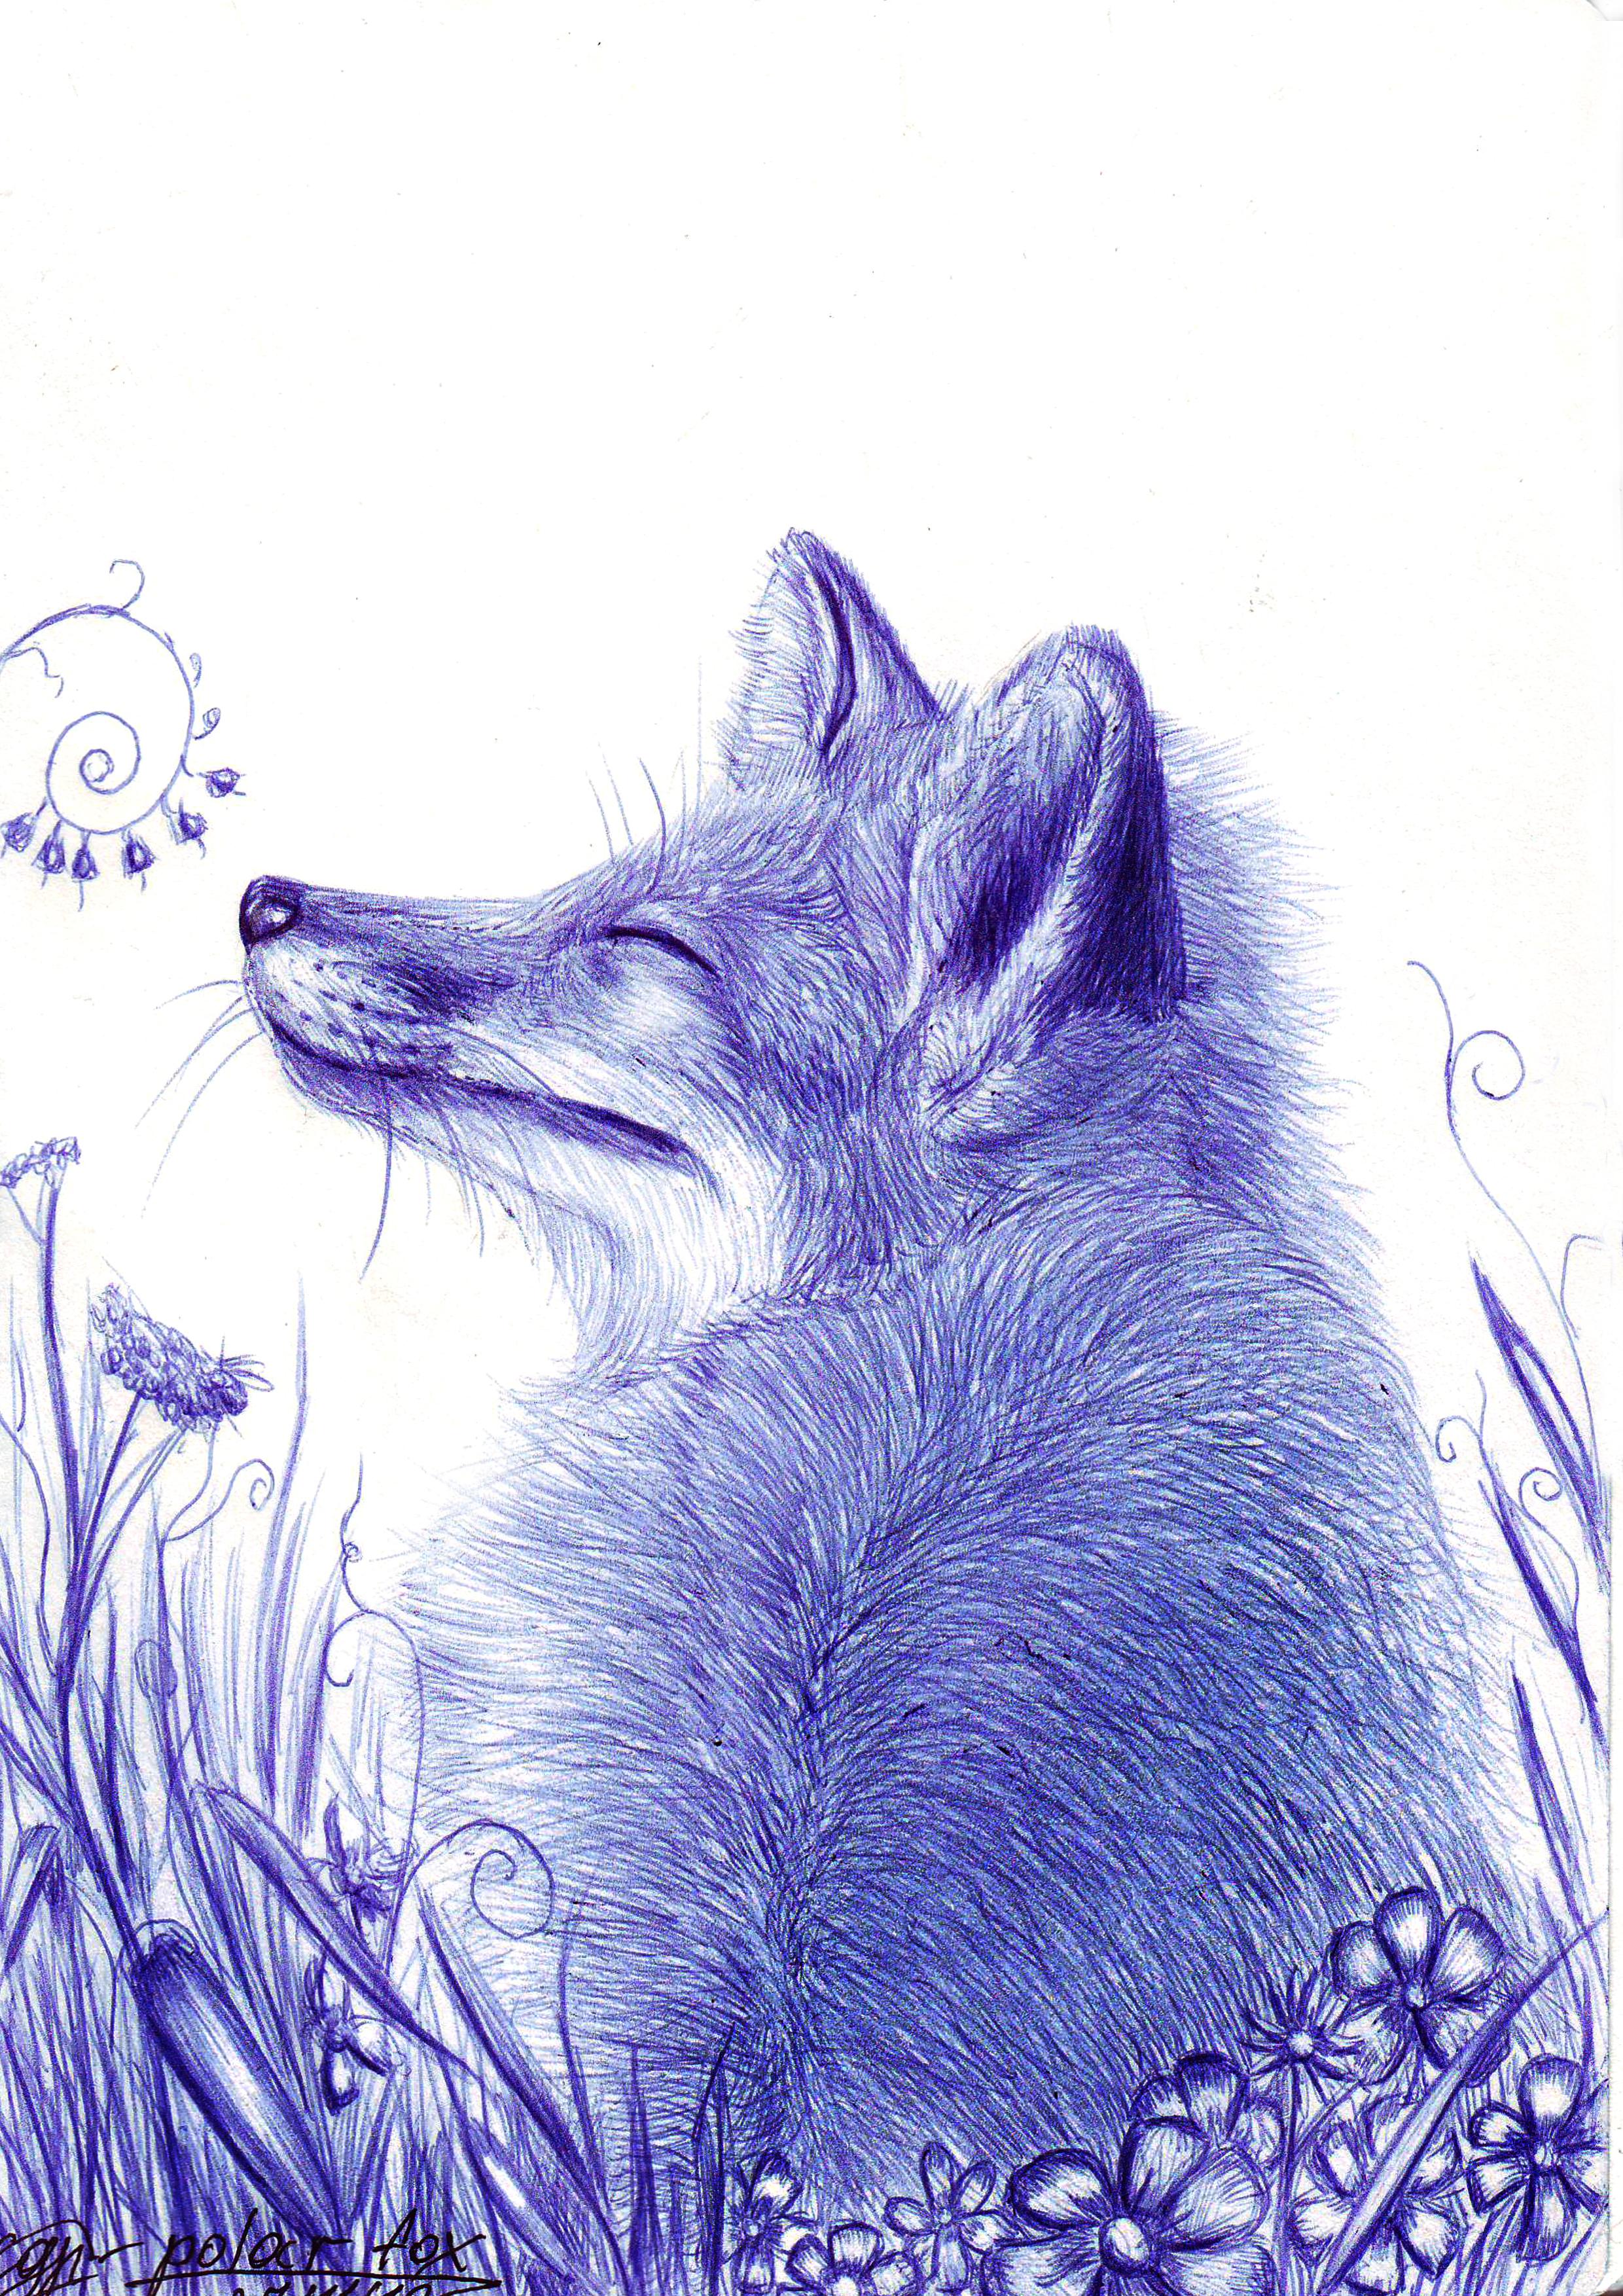 Fox in nature by SvPolarFox